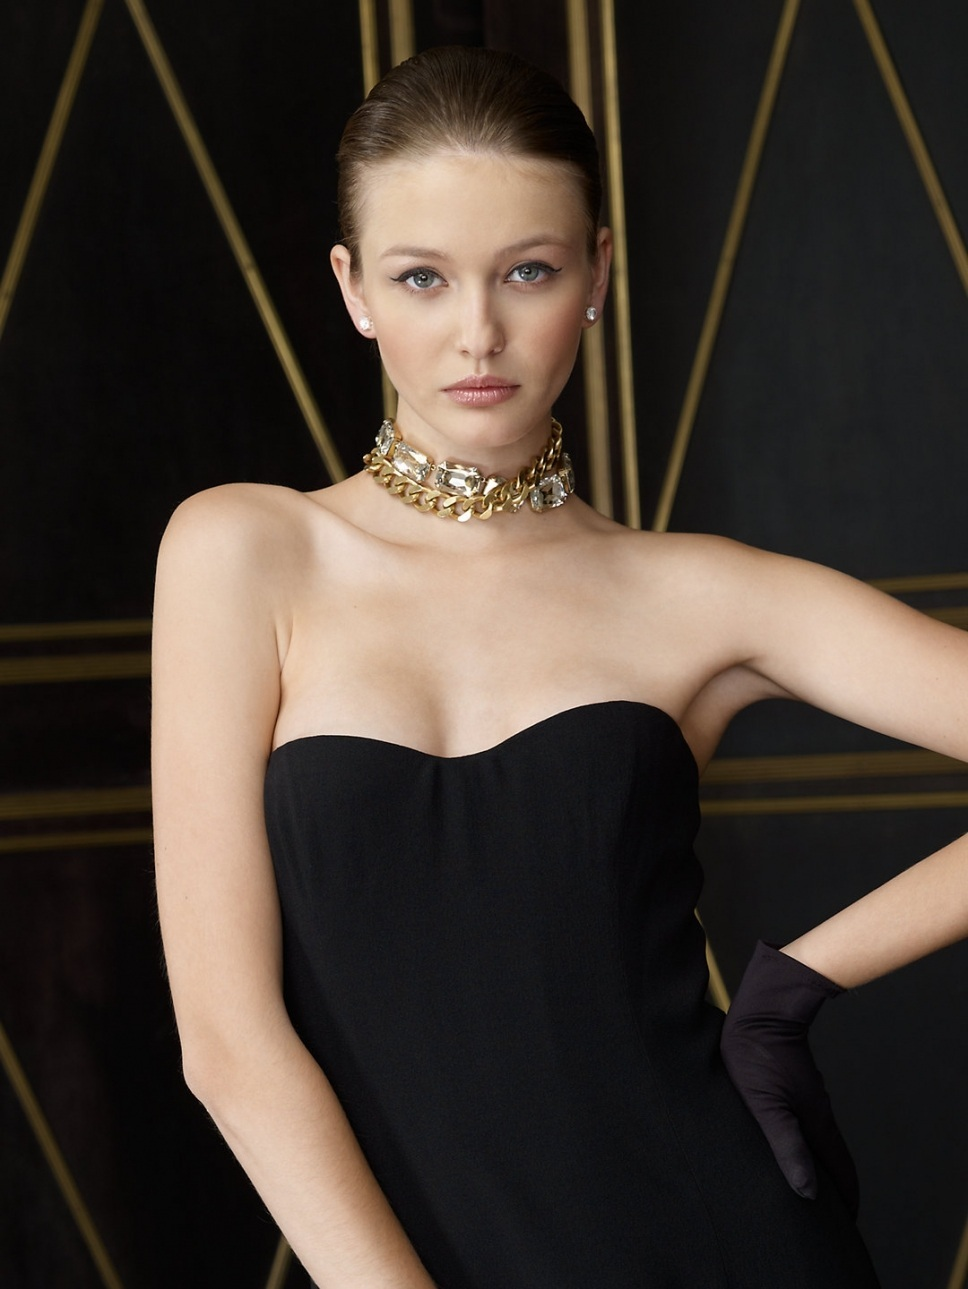 Kristina Romanova: interview with a model